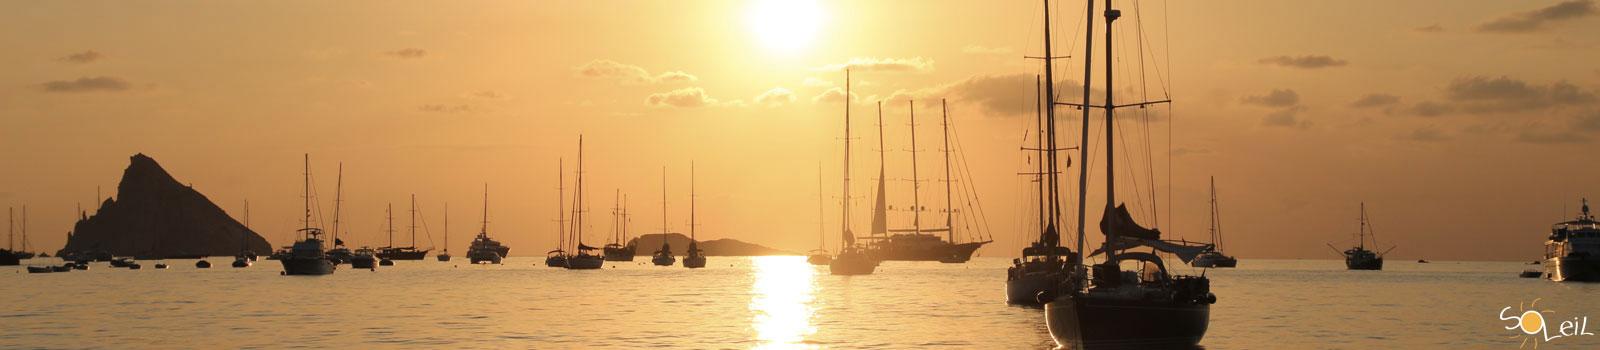 noleggio barca a vela senza skipper